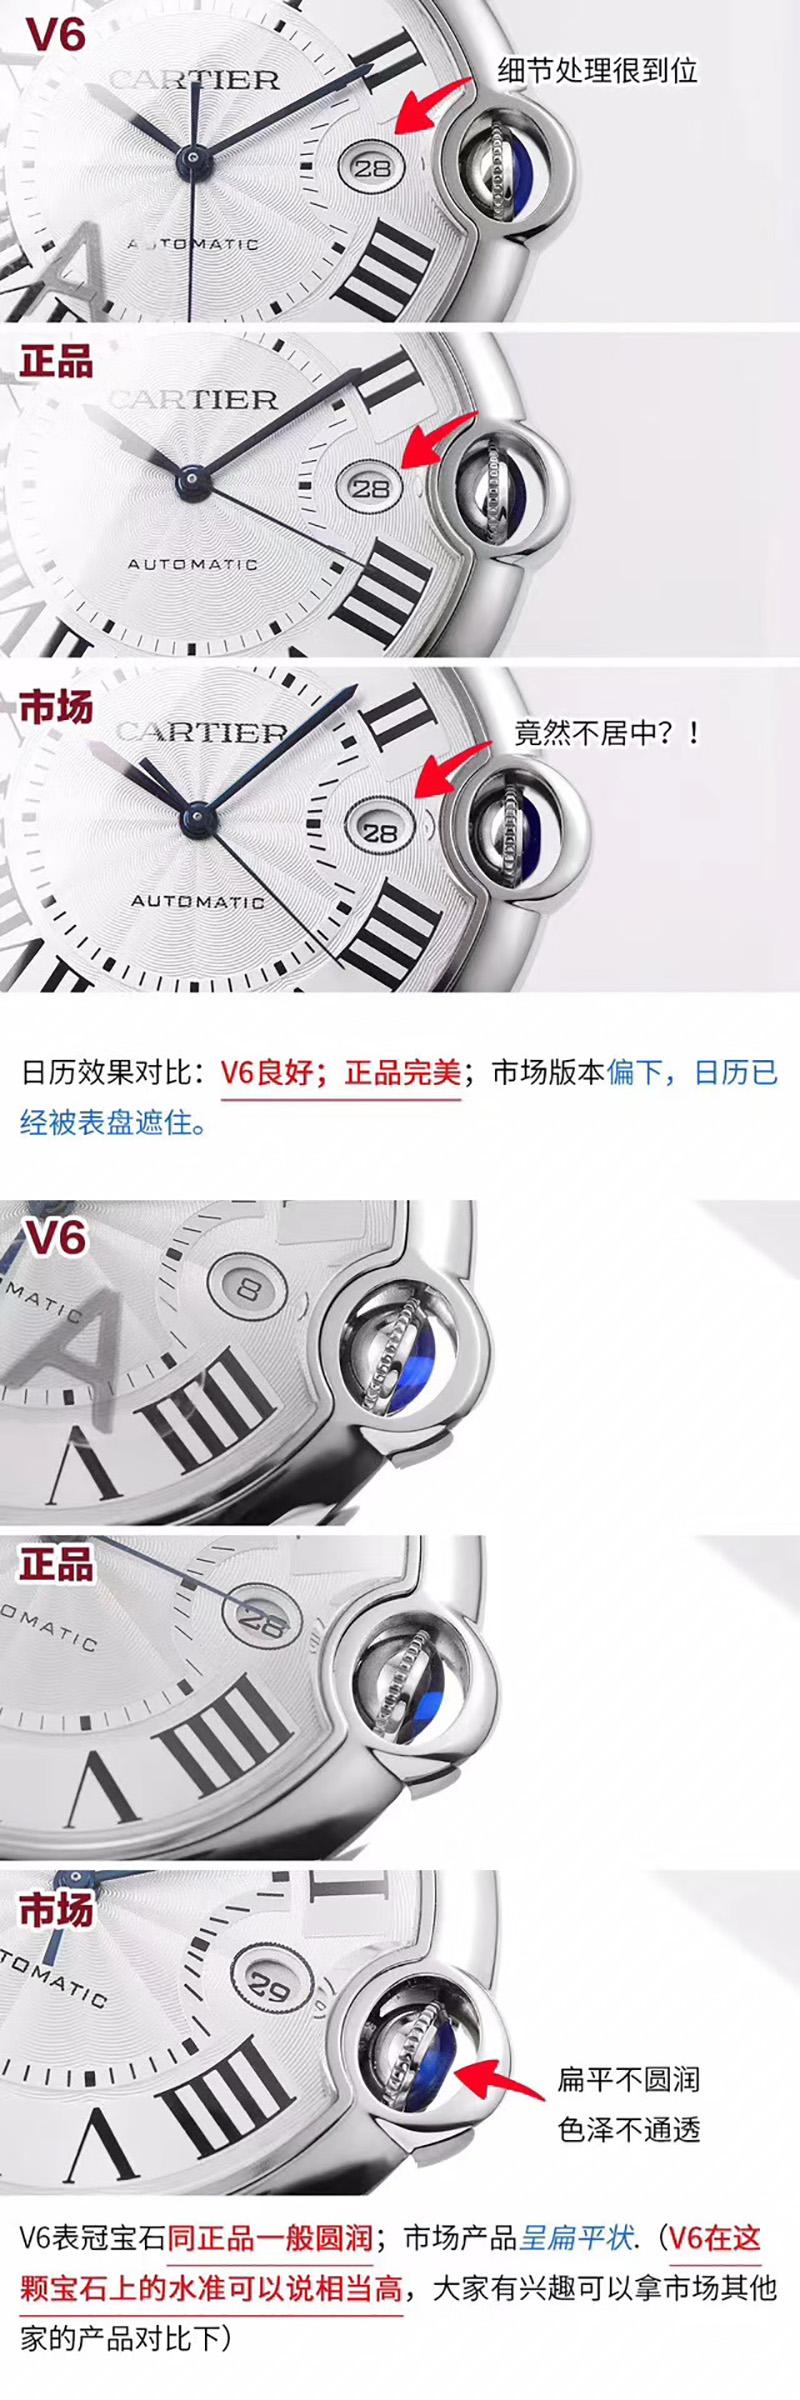 V7版蓝气球-V6厂蓝气球V7版对比正品  第5张